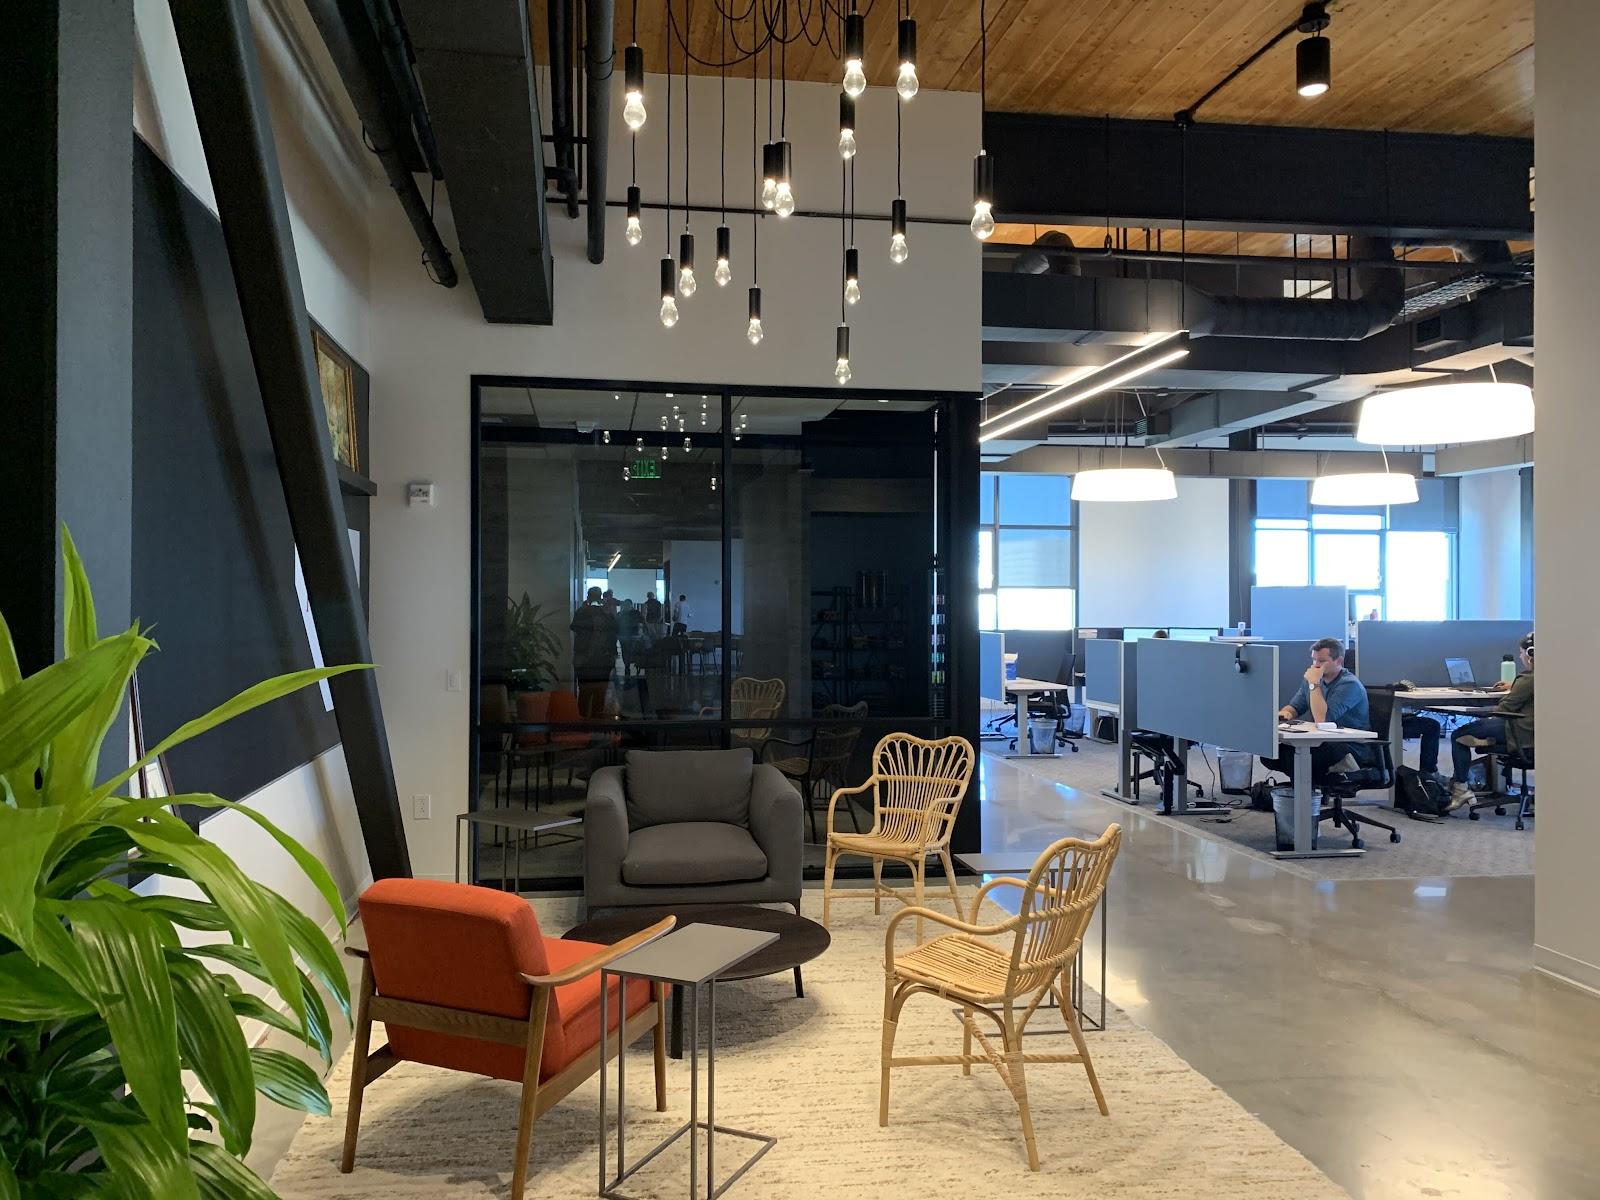 The Realtor.com® office